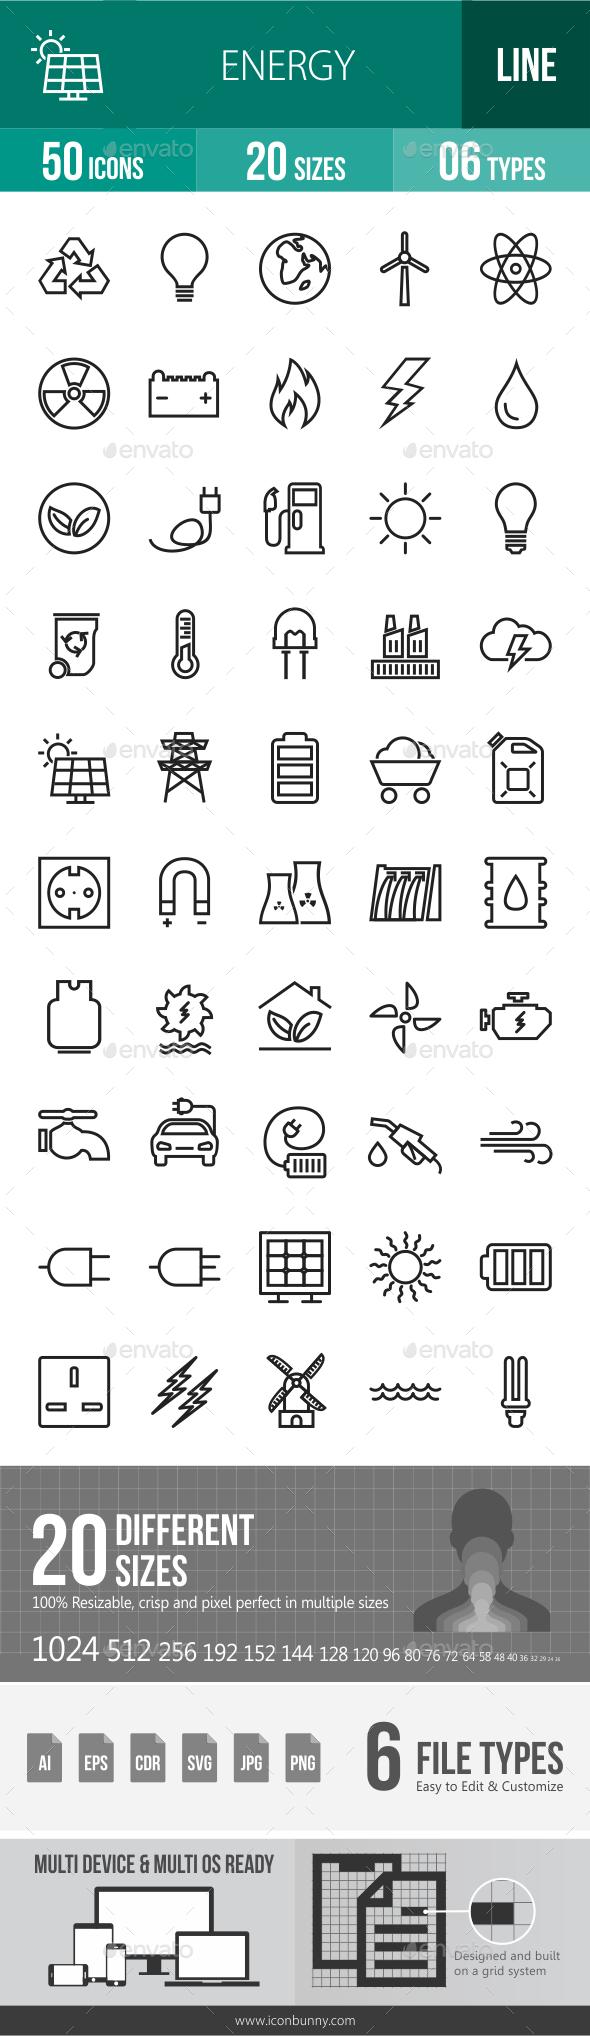 Energy Line Icons - Icons